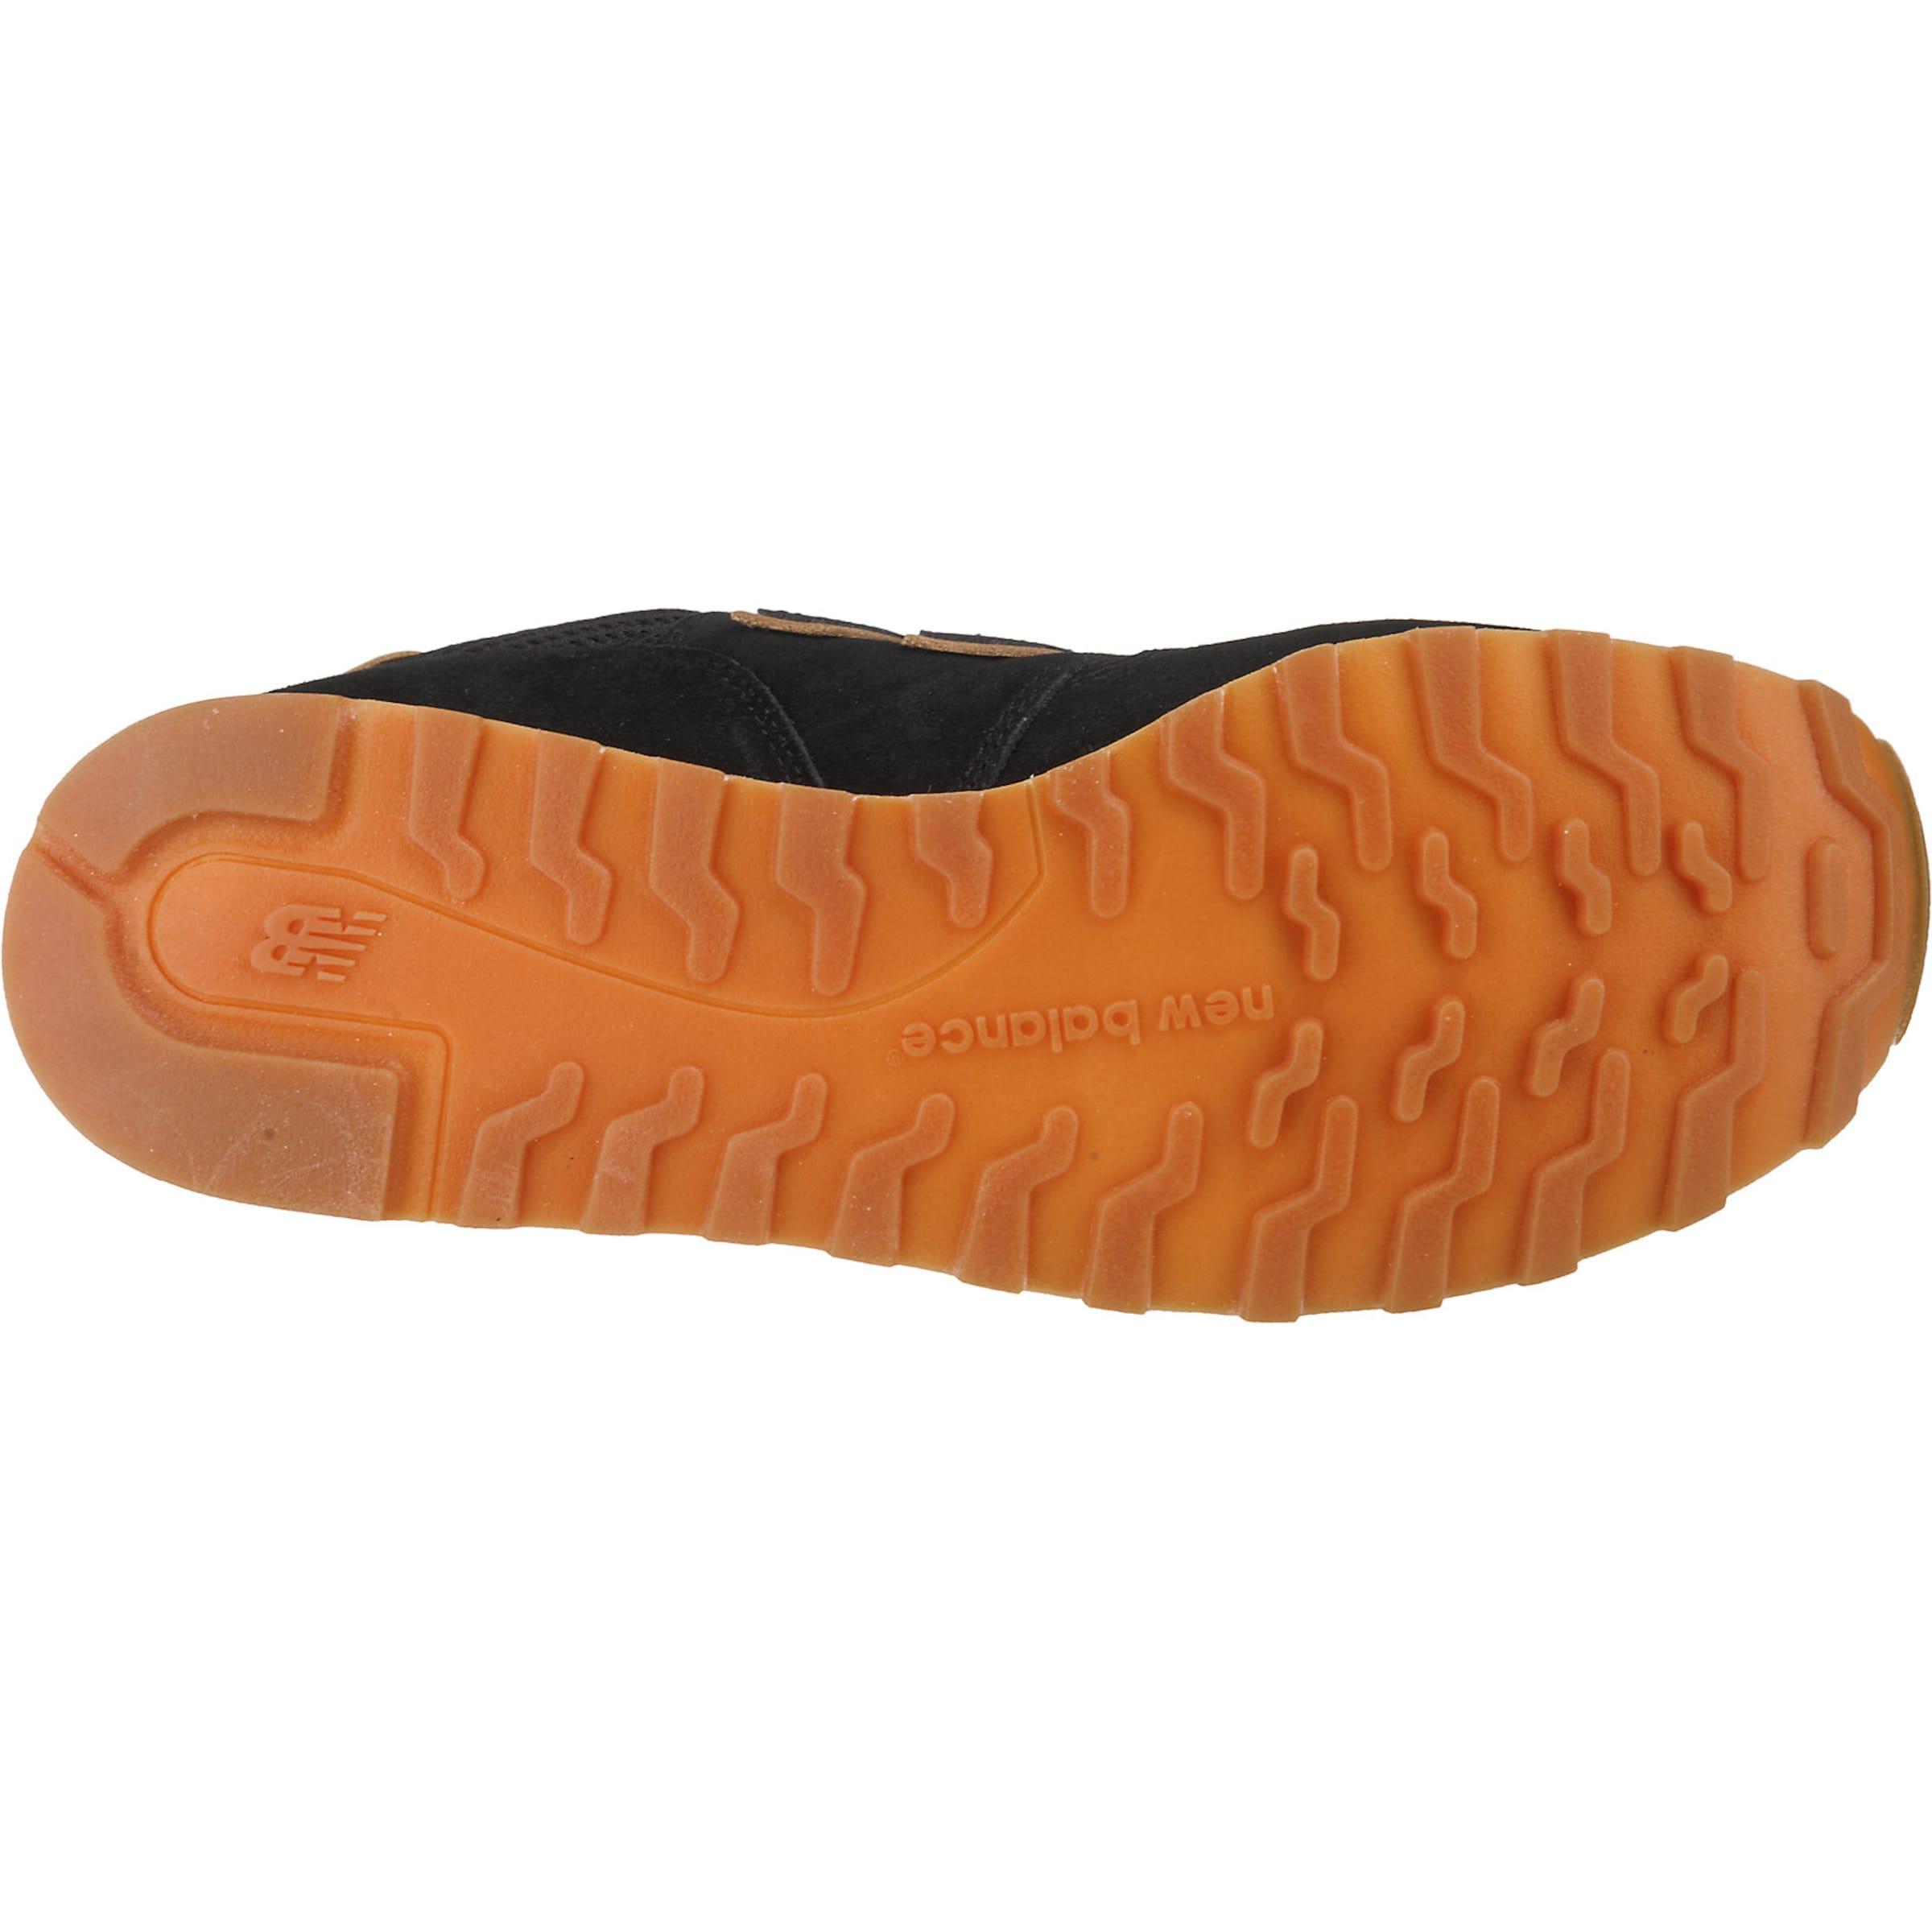 BraunSchwarz New Sneaker New In Balance Sneaker In Balance BraunSchwarz jq35Rc4AL